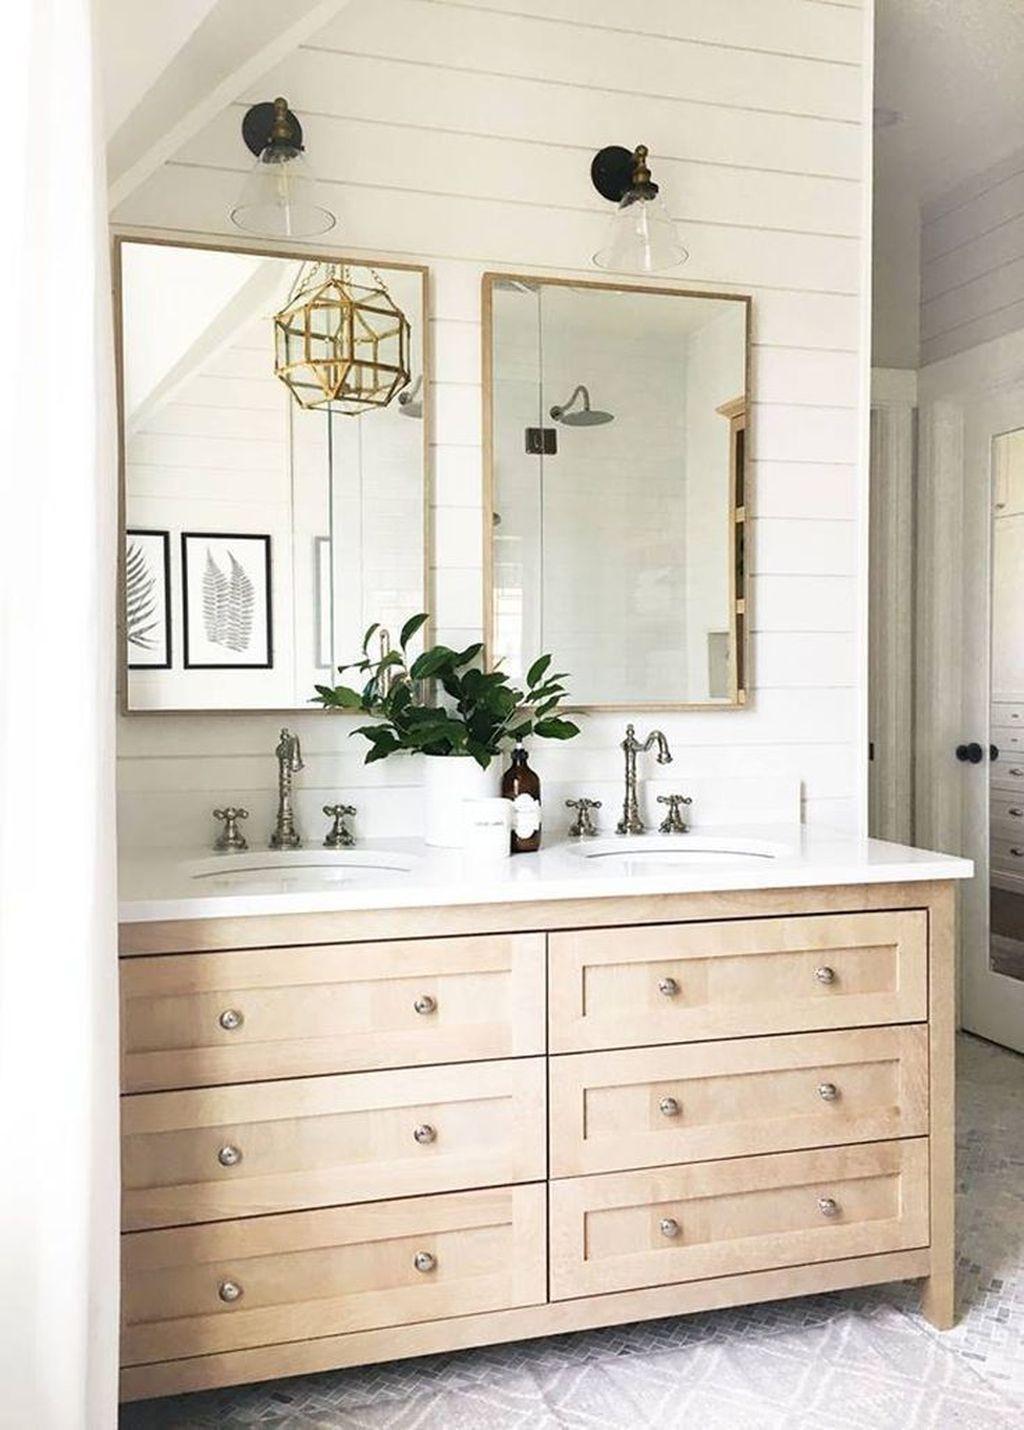 48 Cool Stone Tile Bathroom Designs Ideas | For The Home | Bathroom